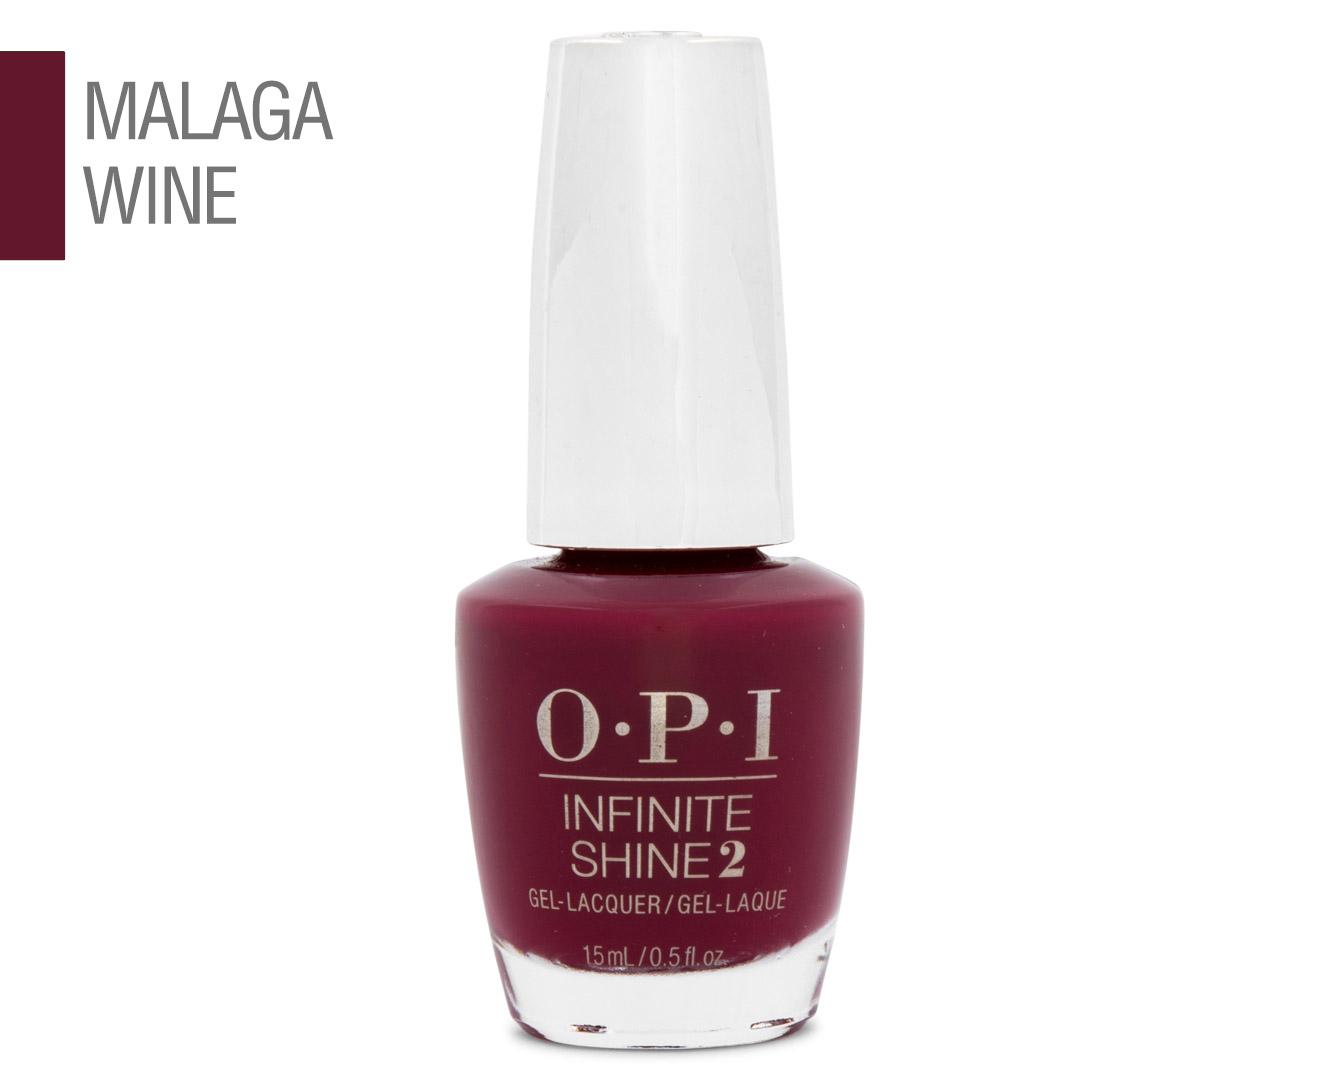 OPI Infinite Shine 2 Gel Nail Lacquer 15mL - Malaga Wine 94100009704 ...